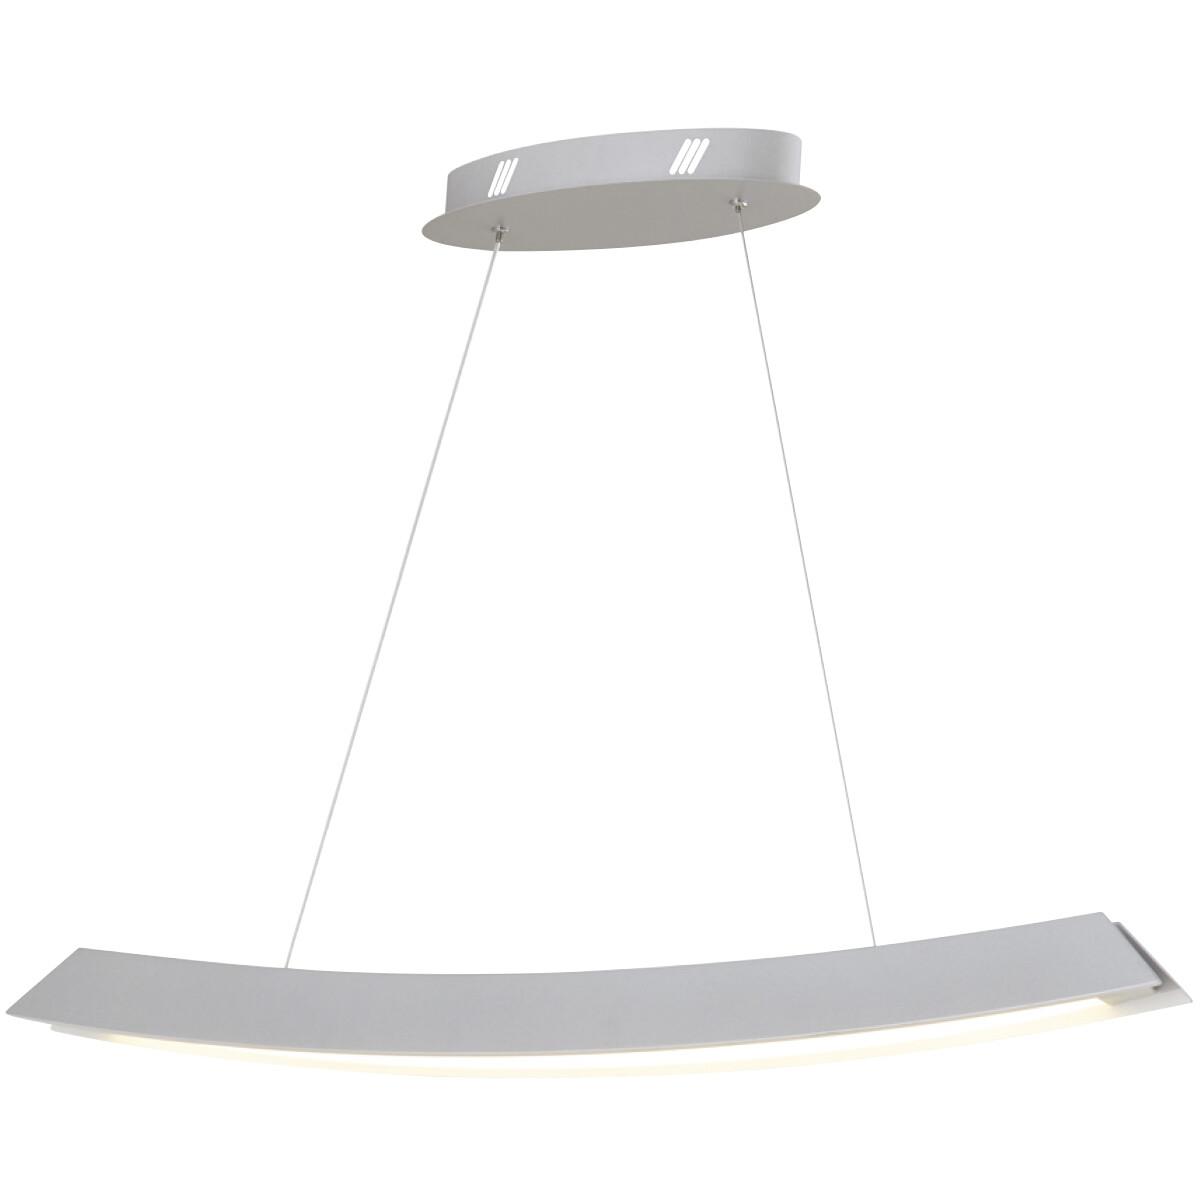 LED Plafondlamp - Plafondverlichting - Casto - 35W - Natuurlijk Wit 4000K - Wit Aluminium